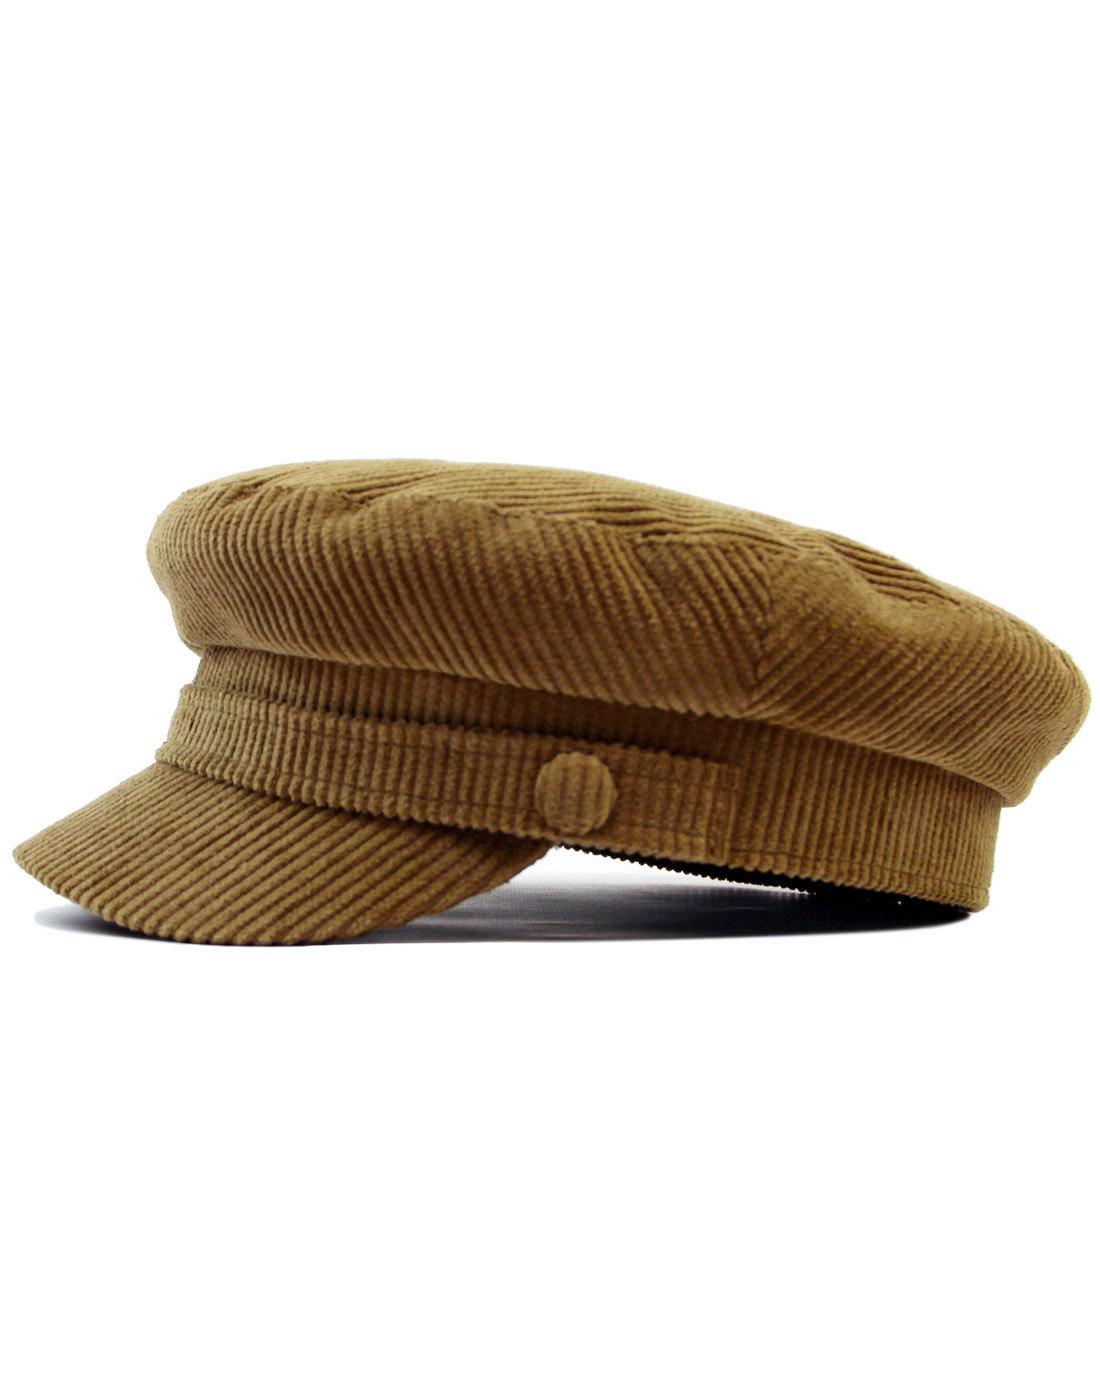 Beatle MADCAP ENGLAND Retro Cord Lennon Hat (F)